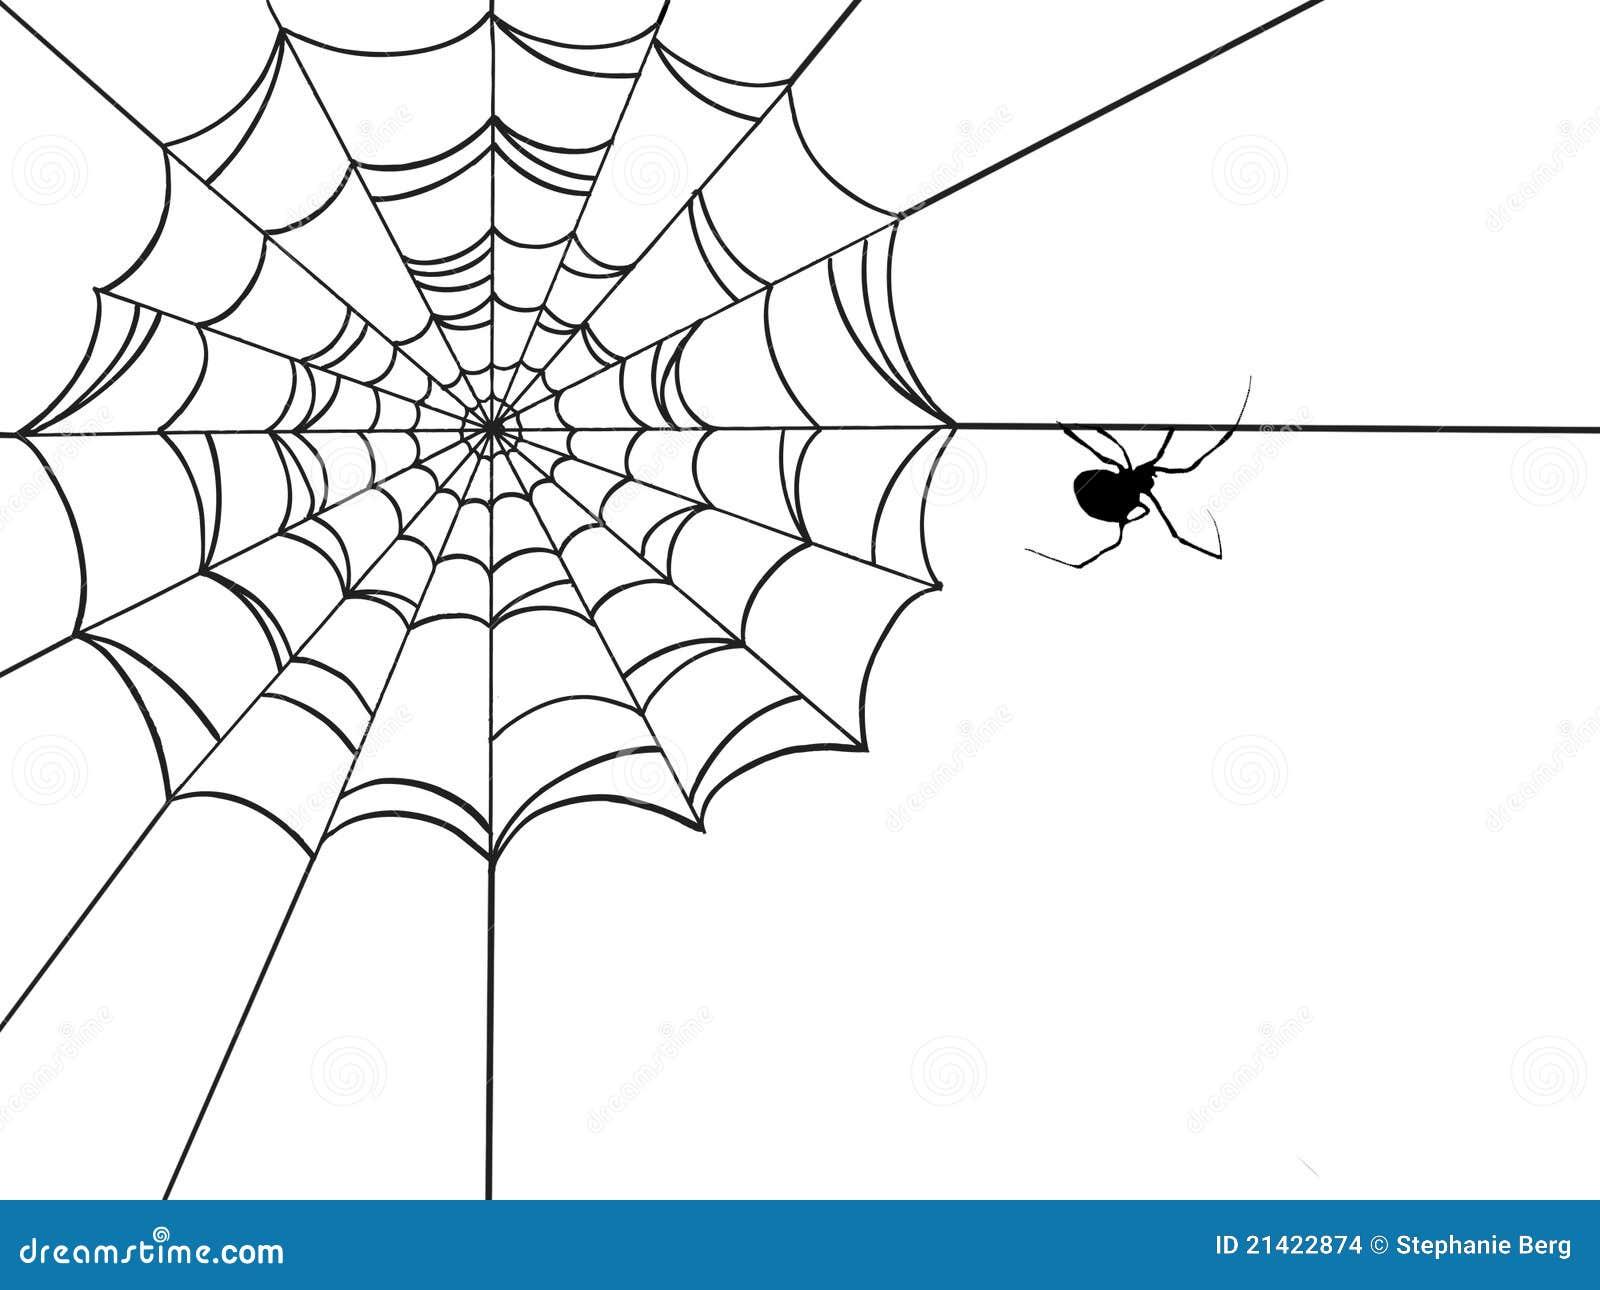 Corner spider web design - photo#4